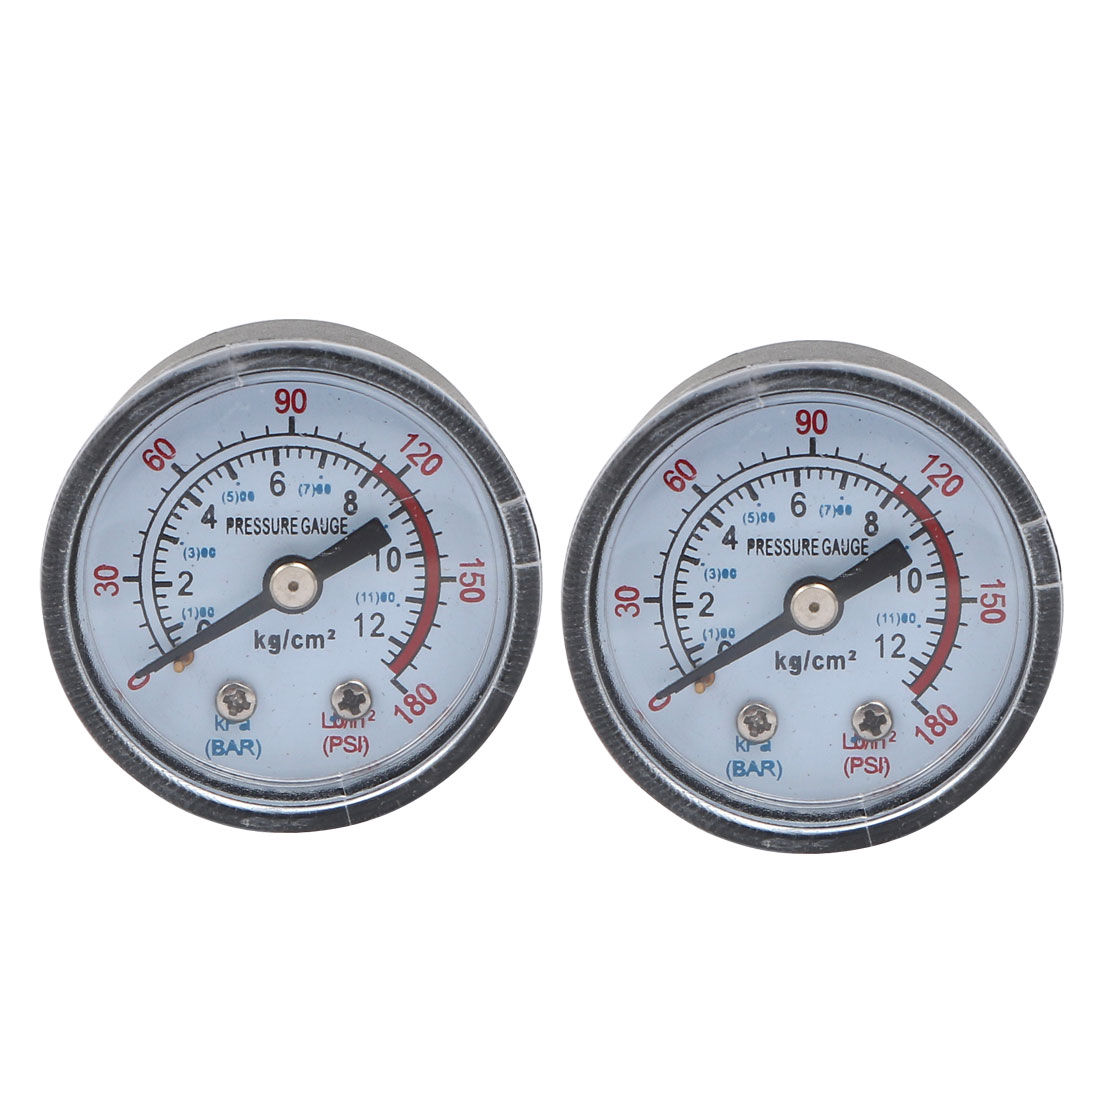 2pcs Horizontal Mount 1/8PT Thread Water Air Pressure Gauge 0-12kg/cm2 0-180psi